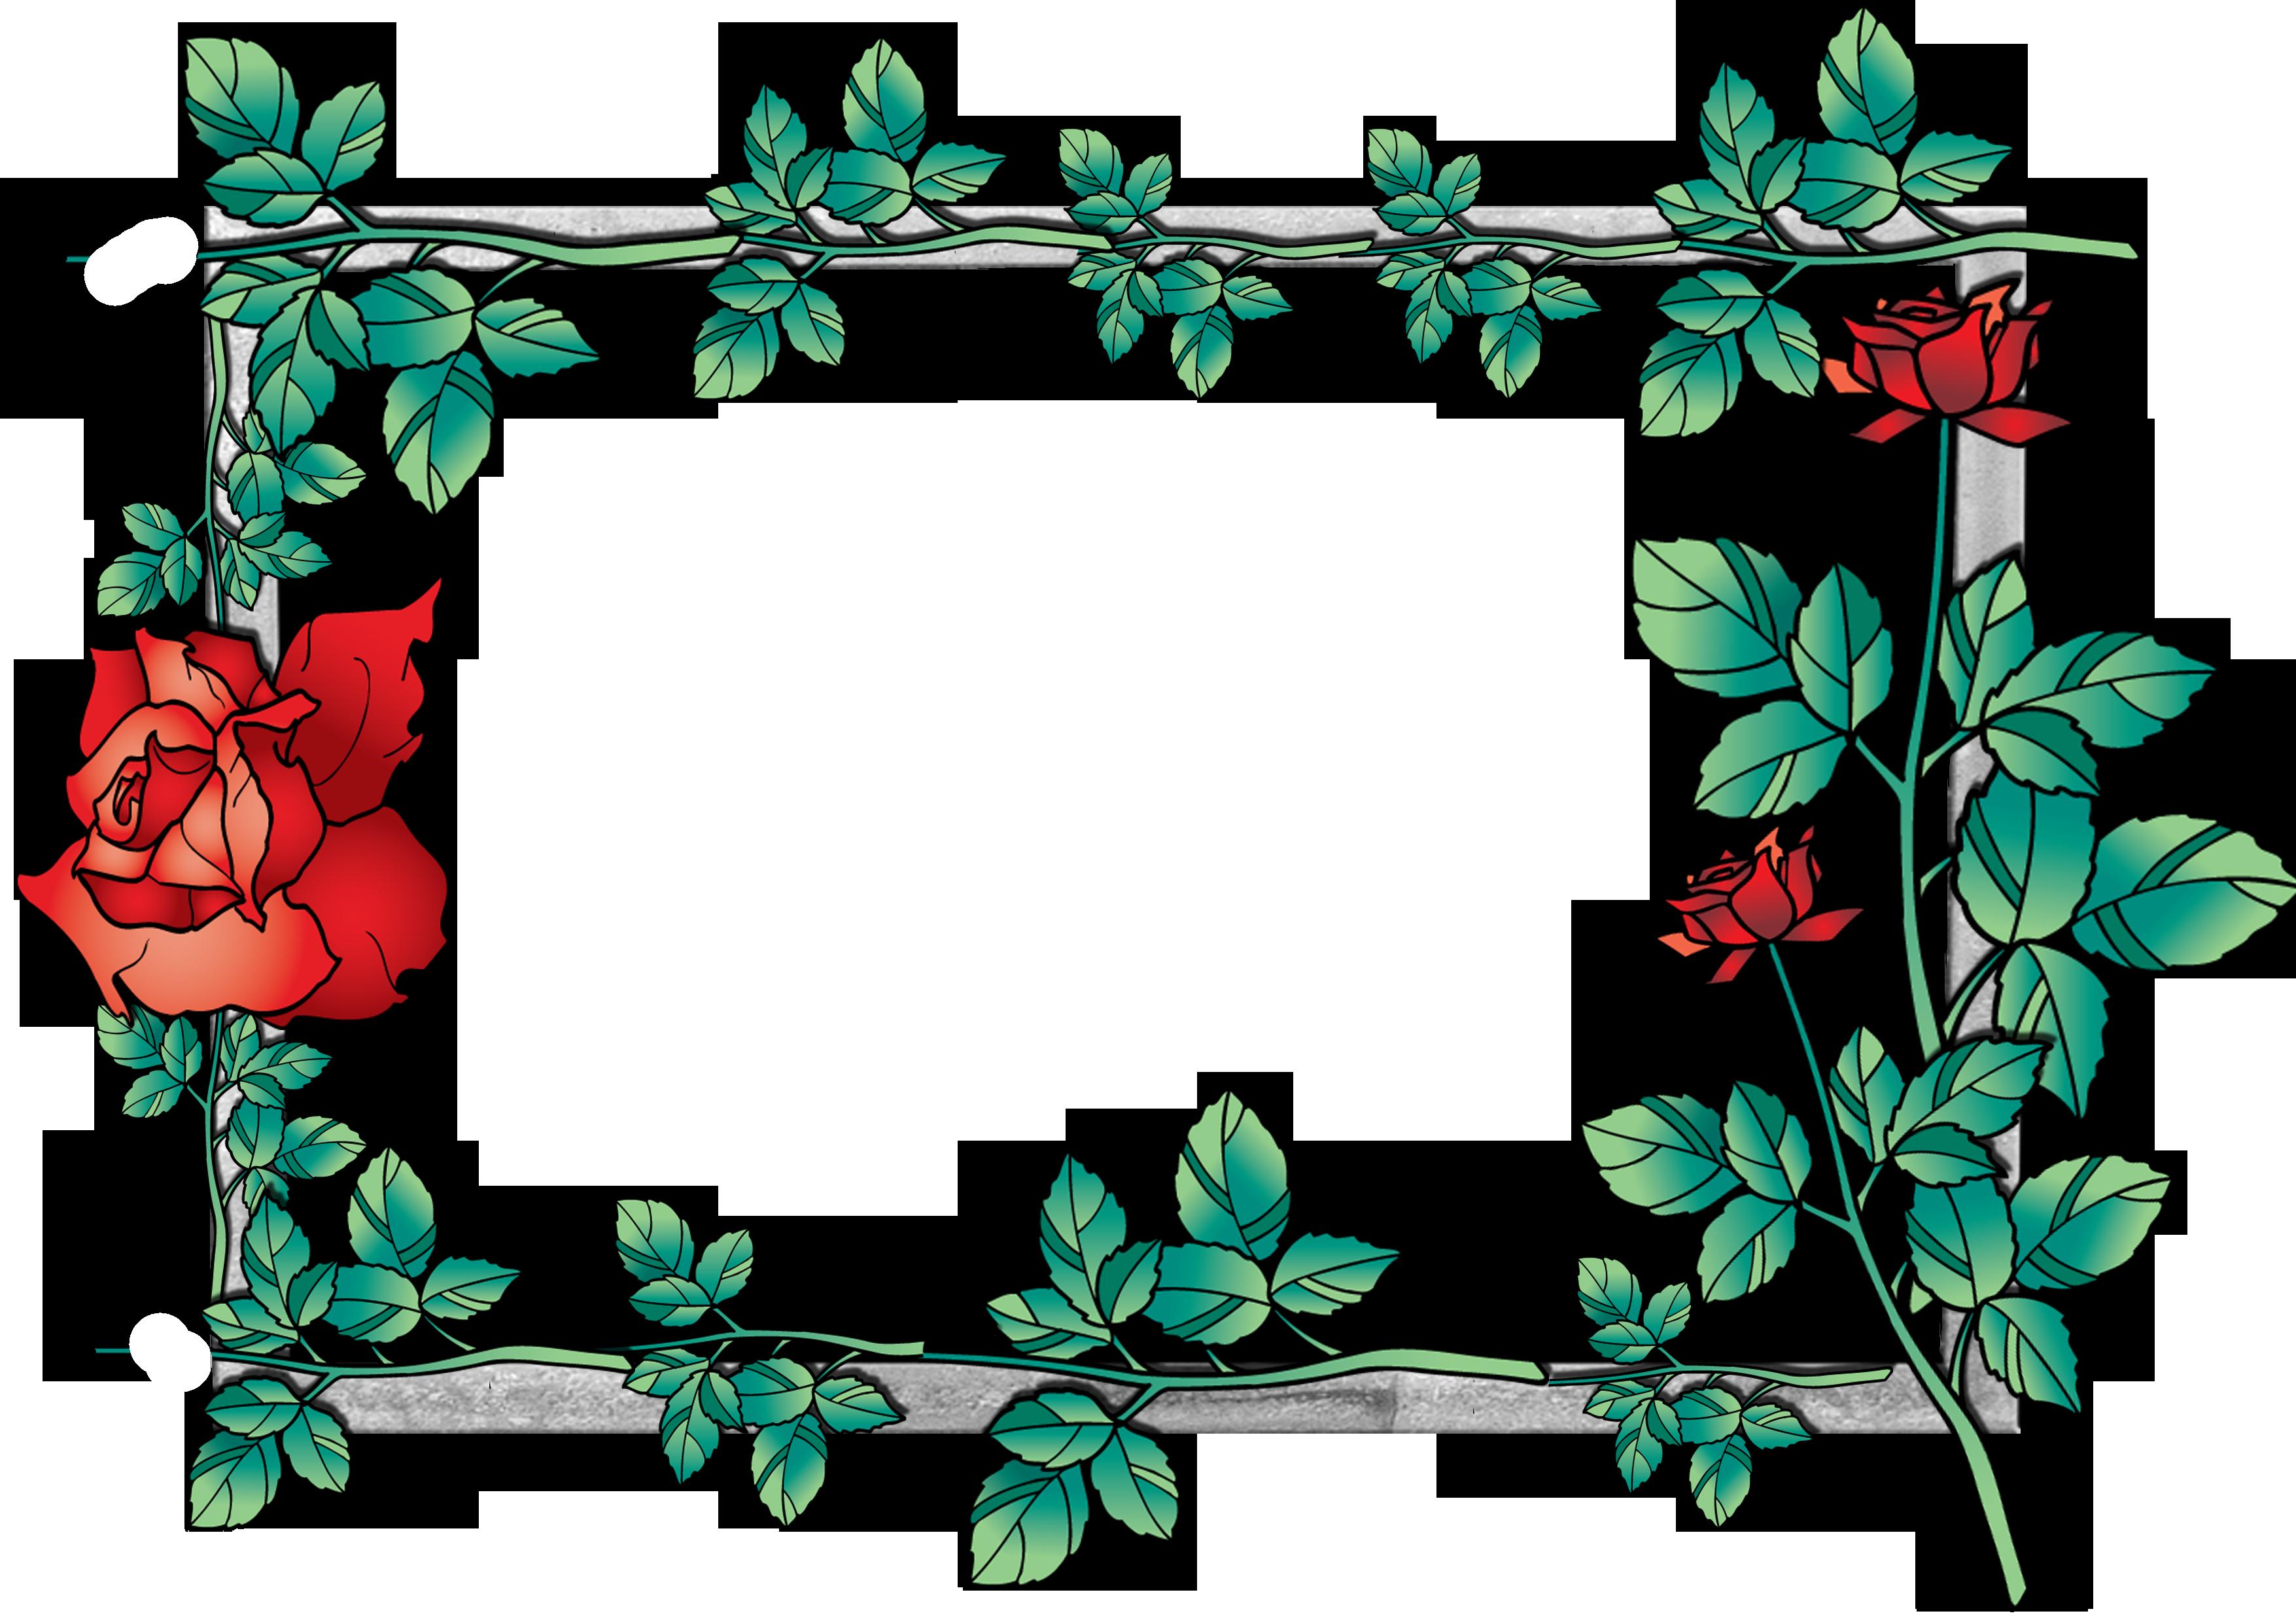 Flower frames clipart jpg transparent stock Flowers frame (1) | Gallery Yopriceville - High-Quality Images and ... jpg transparent stock